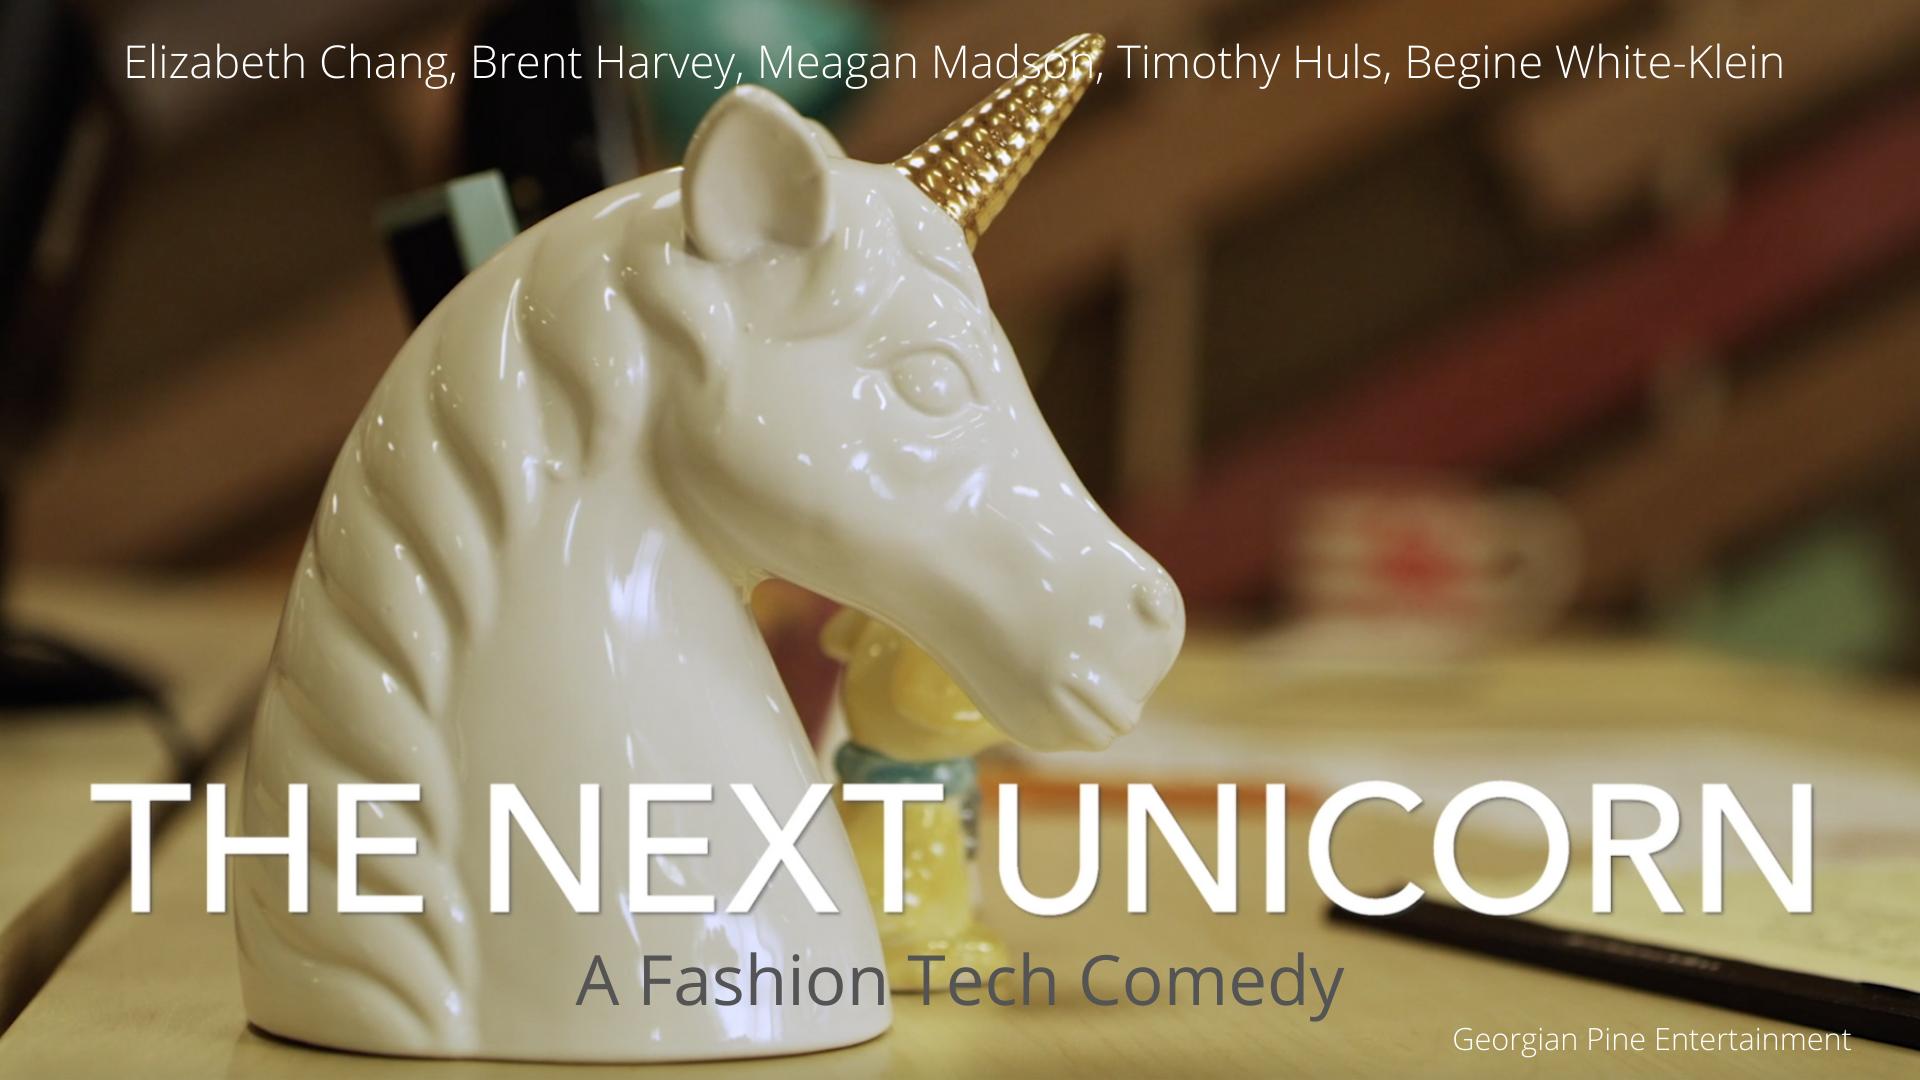 The Next Unicorn